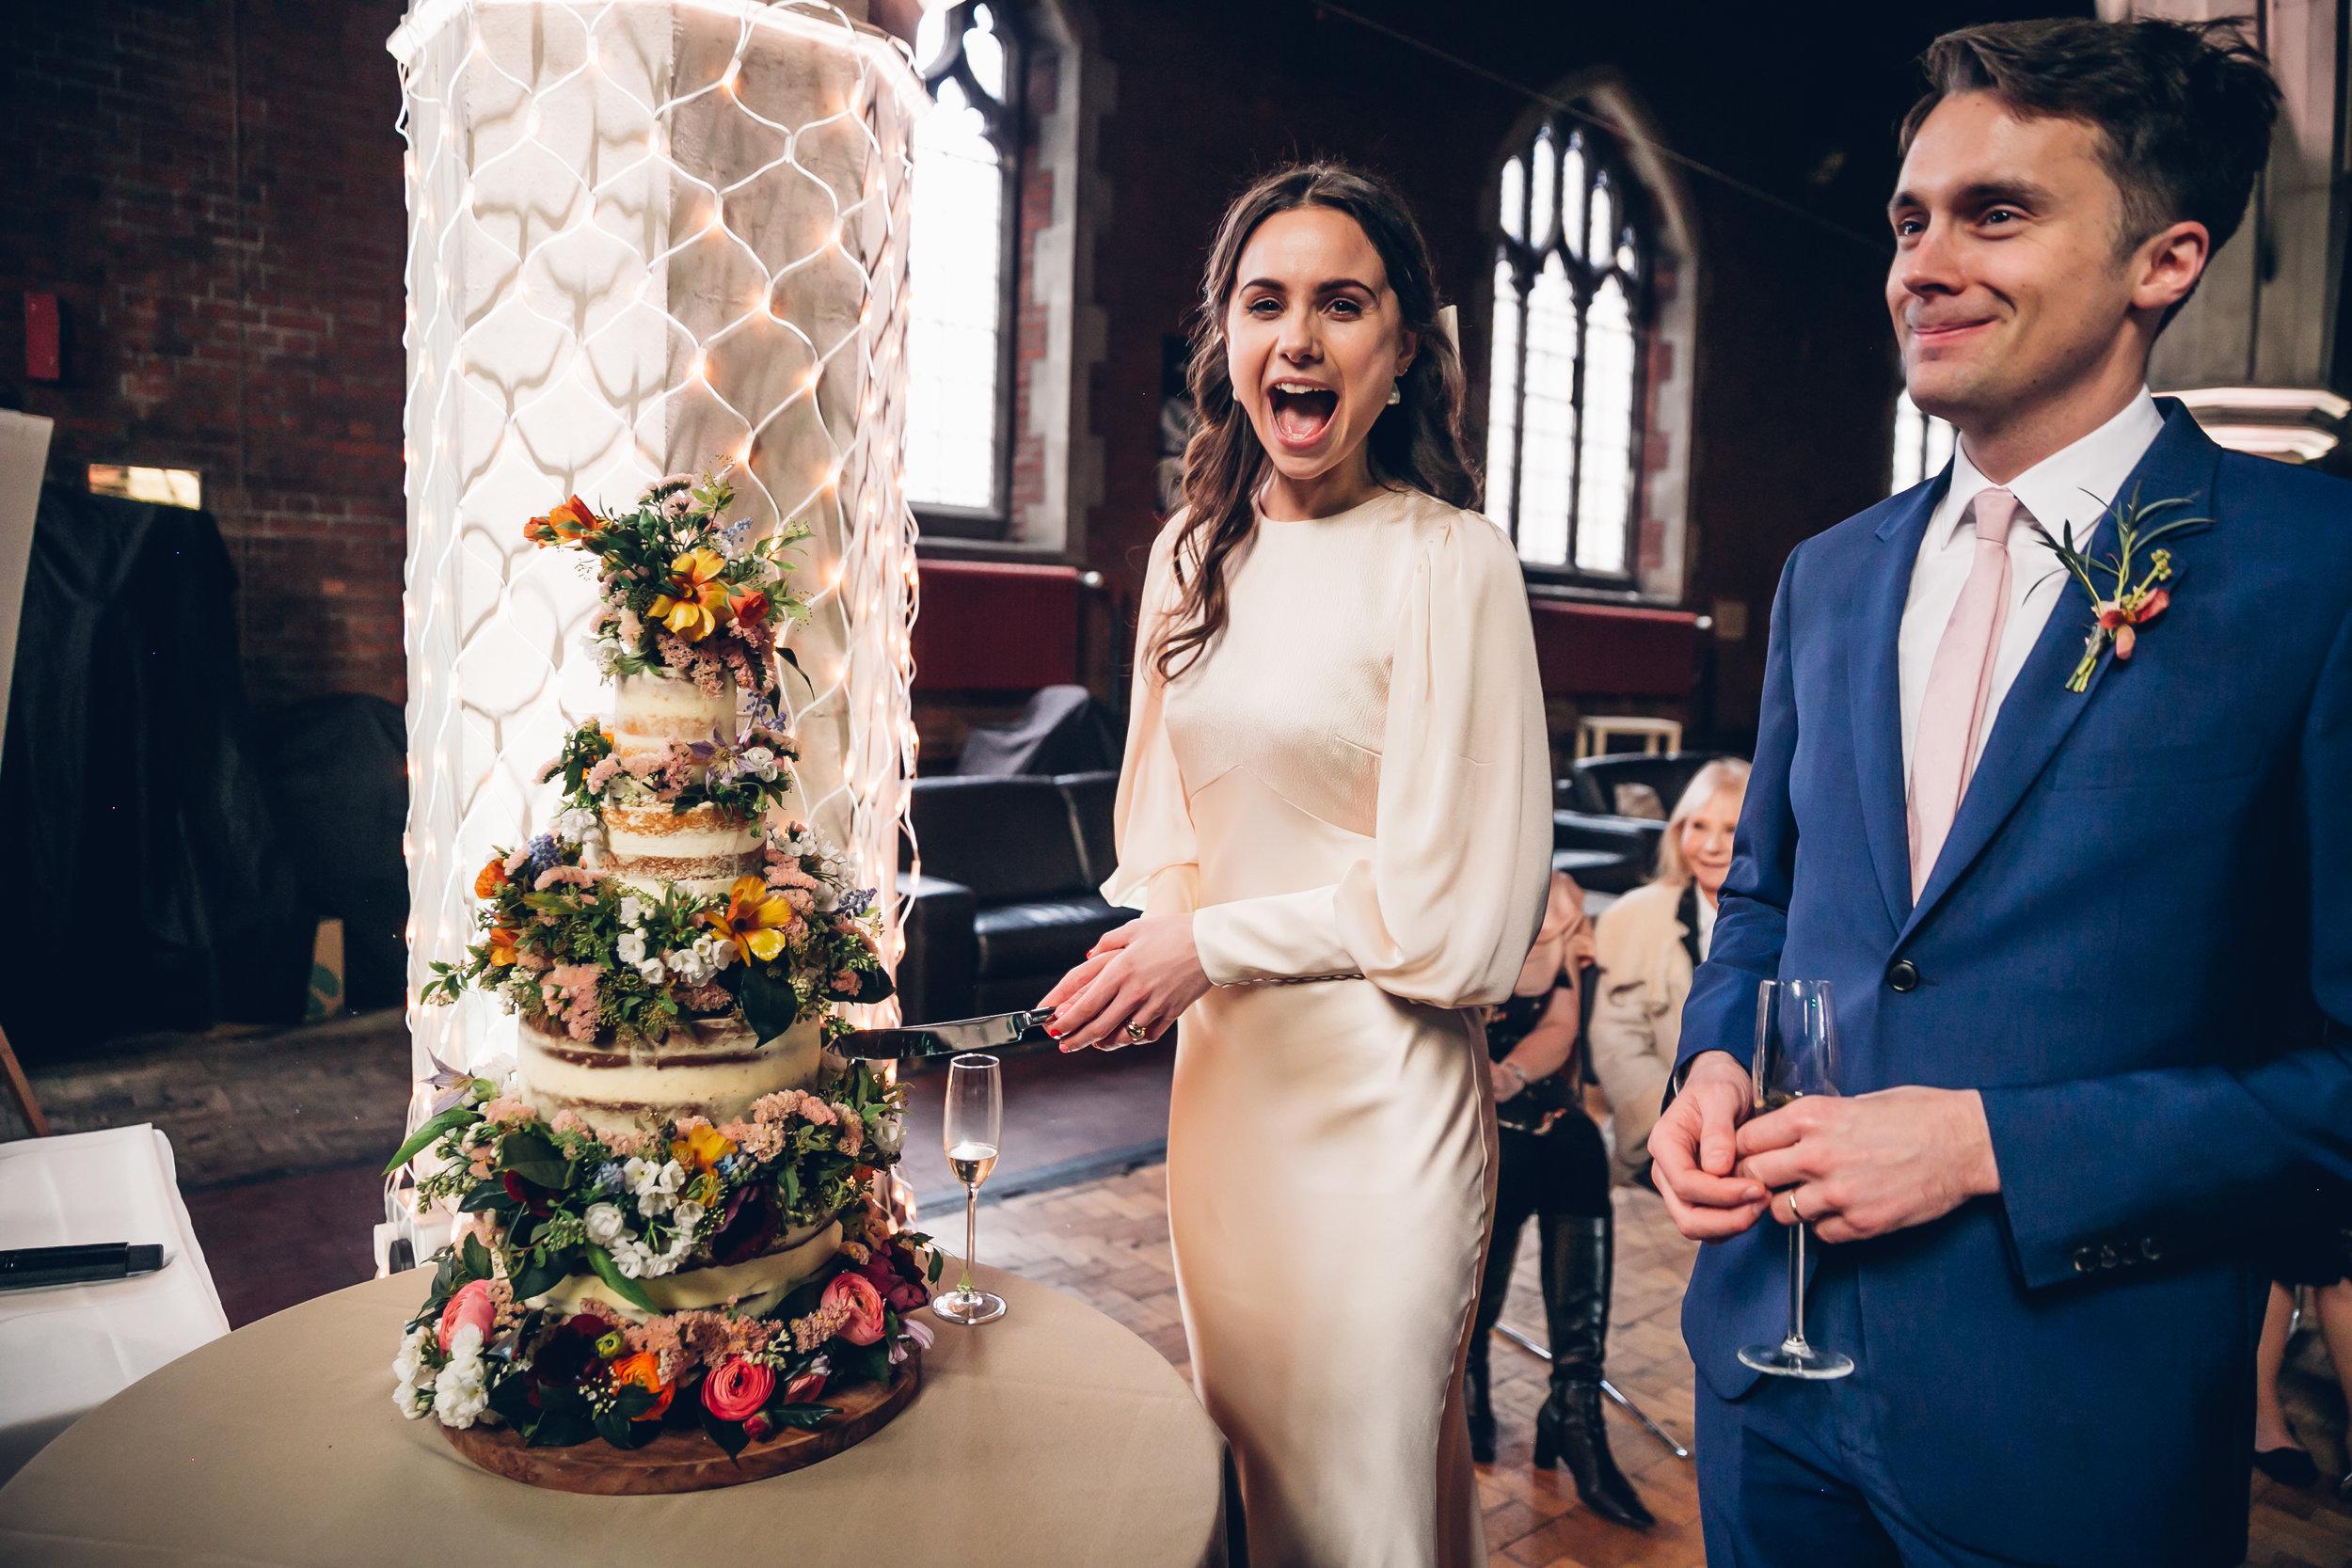 The Hill Food Company wedding cake 2-2.JPG